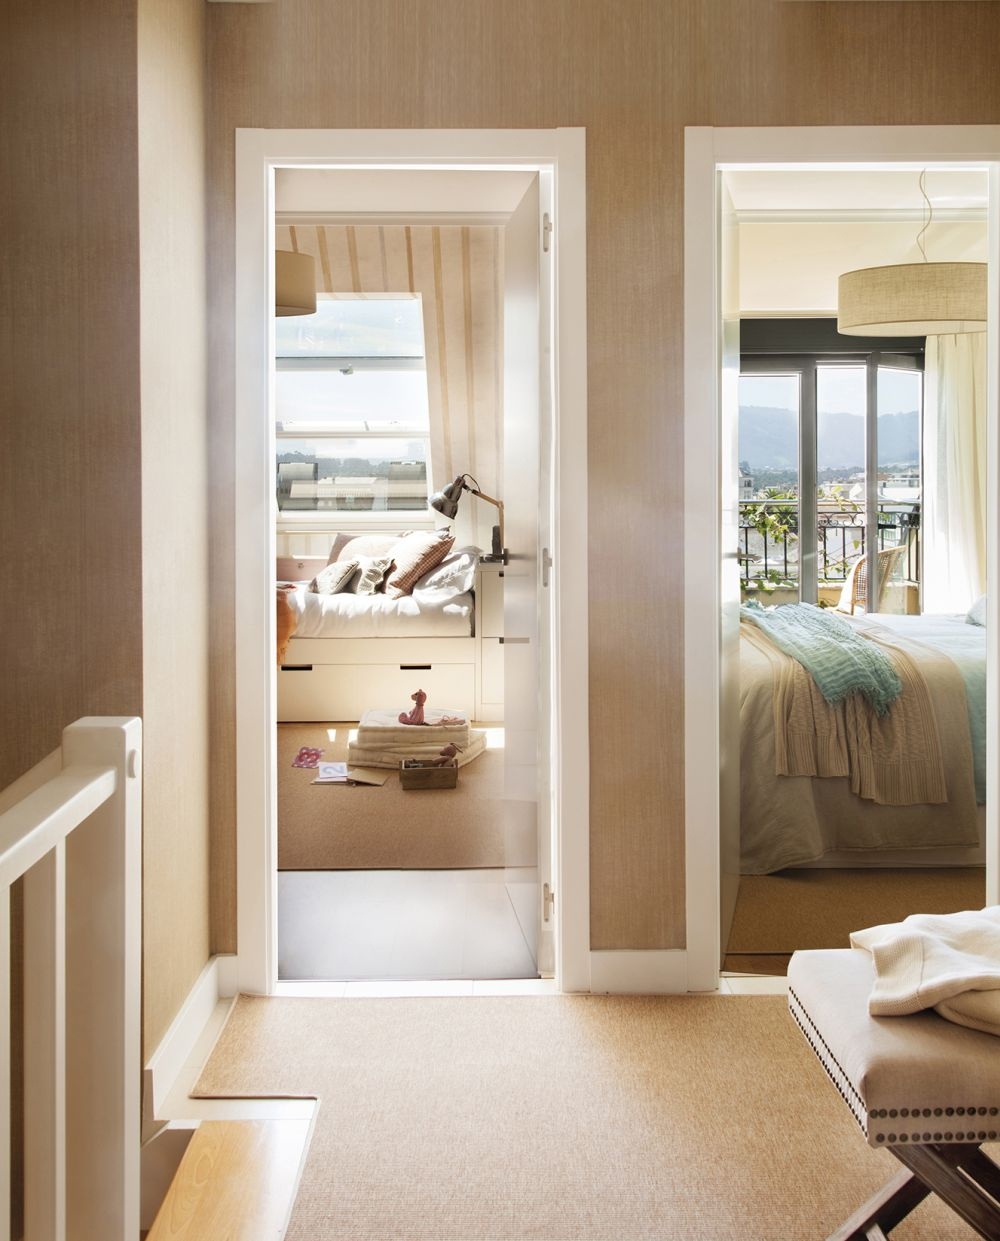 adelaparvu.com despre duplex 60 mp, Spania, designer Celia Crego, Foto Celia Crego si ElMueble, Felipe Scheffel (10)